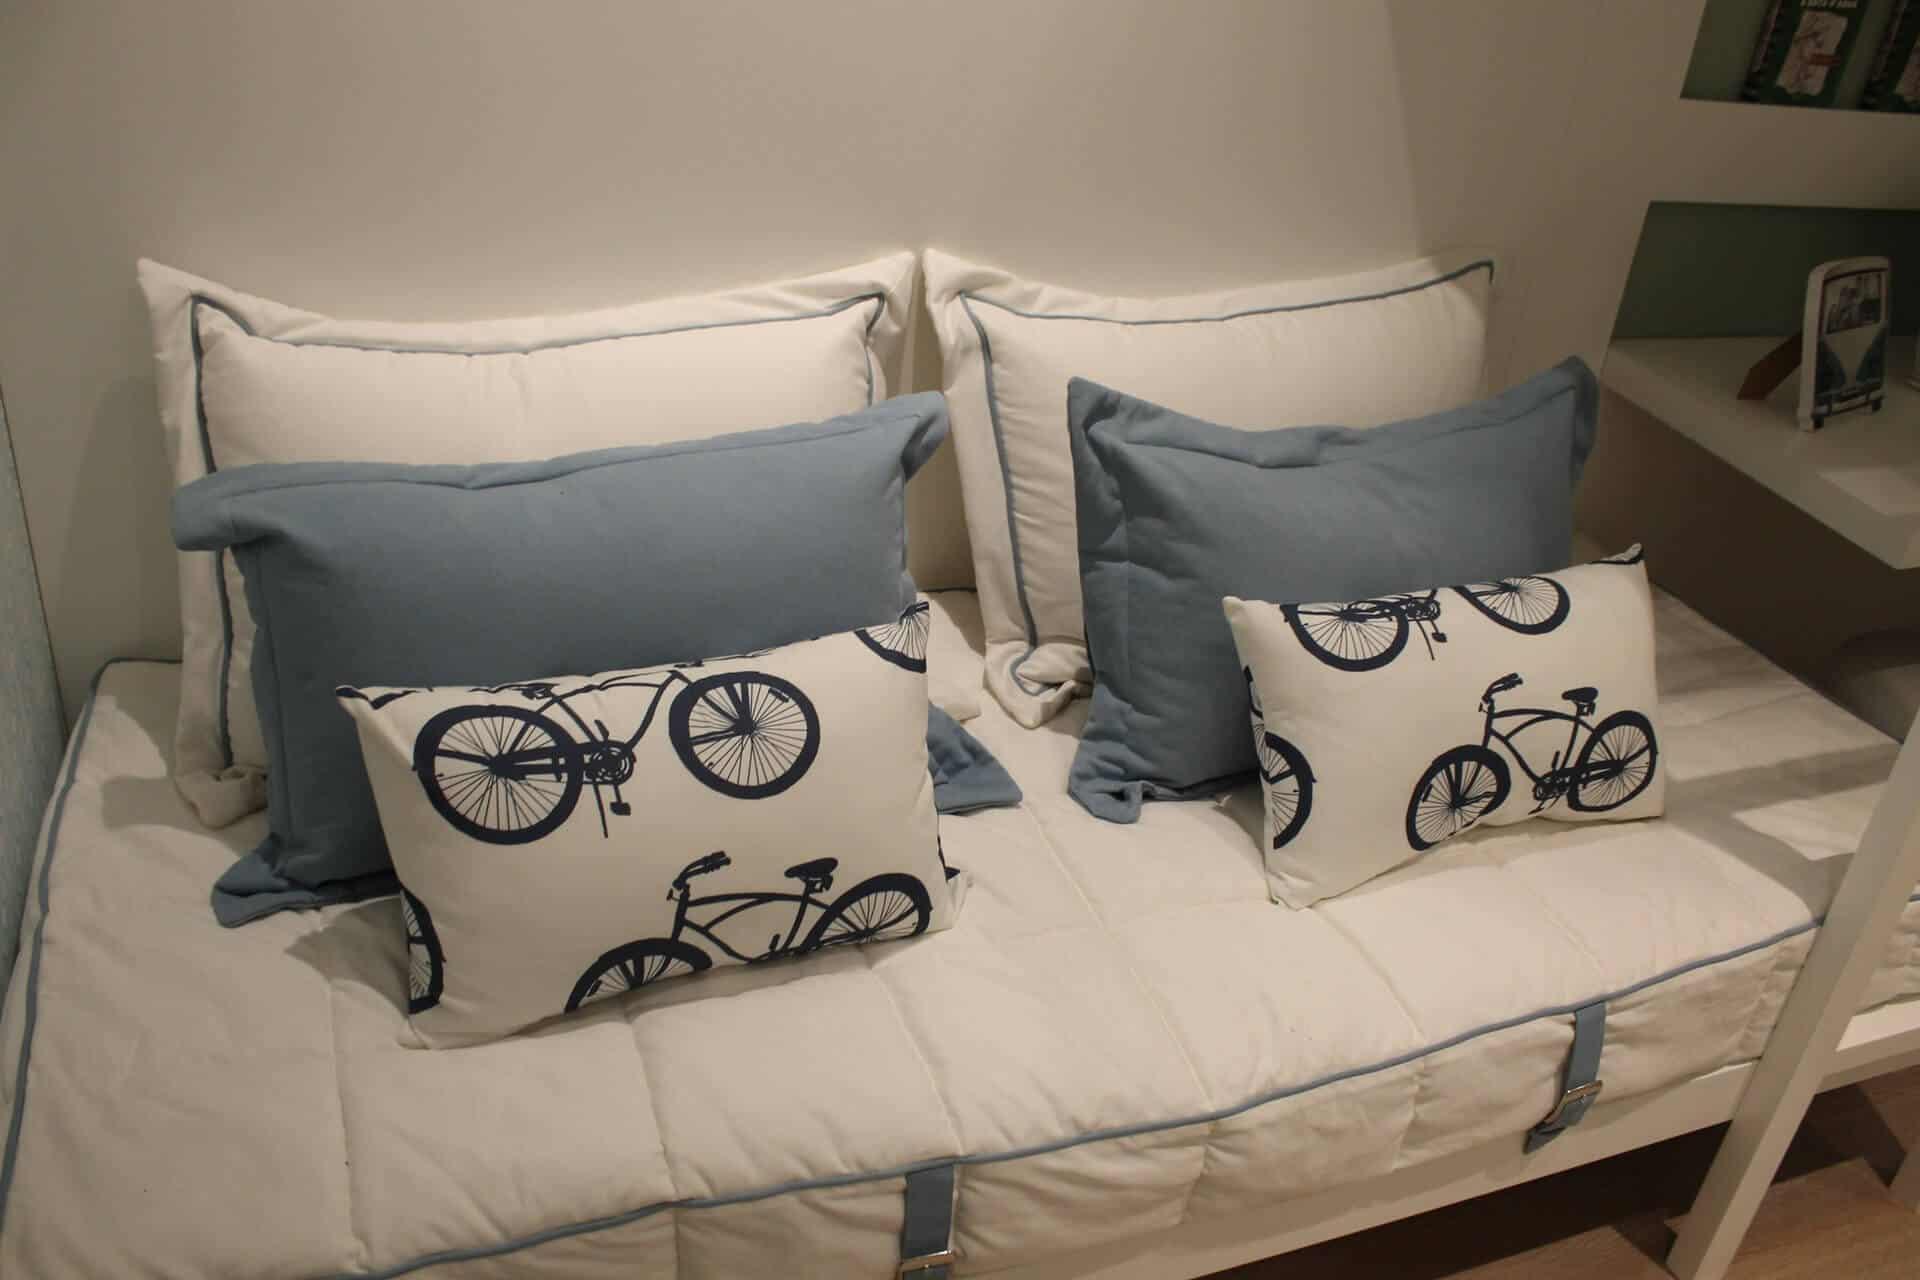 dormitorio-planejado_moveis-sob-medida-galeria-54